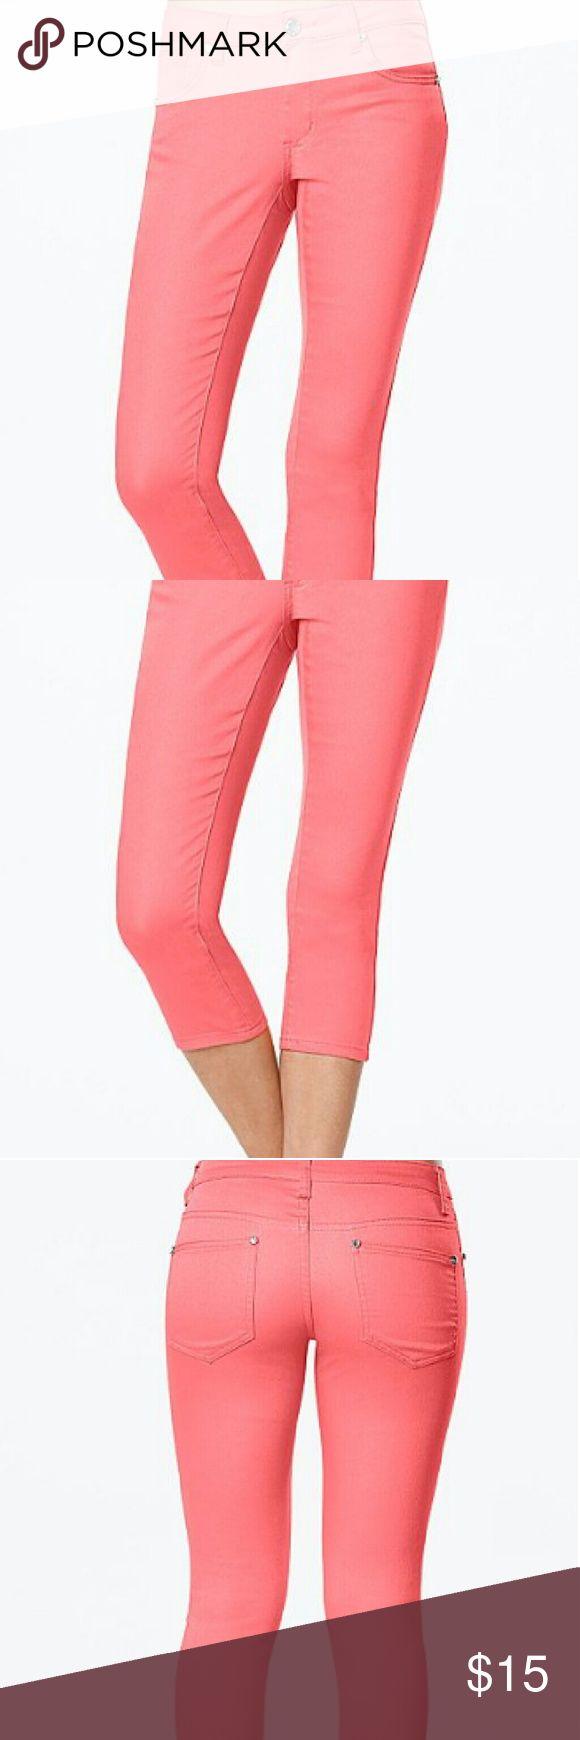 Capri jeans coral Capri jeans .Jeweled button closure and rivets Pants Capris